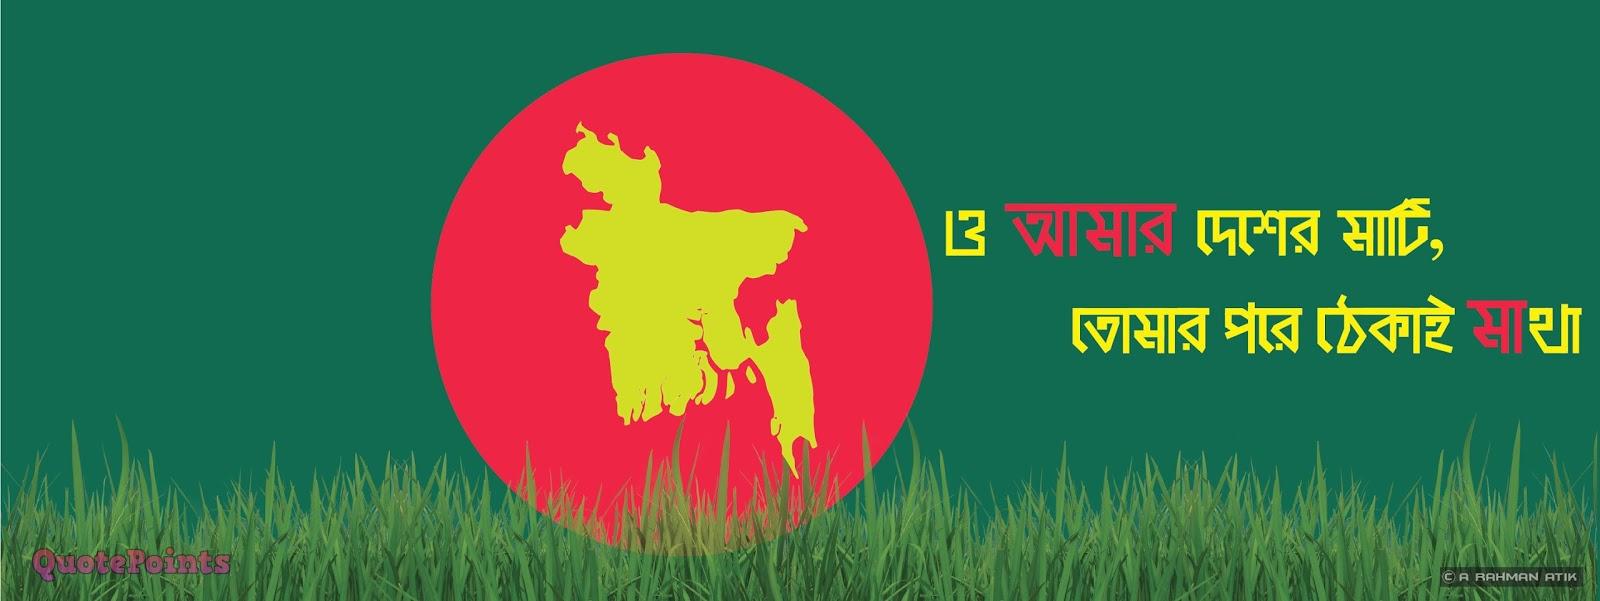 victory day of bangladesh 2017